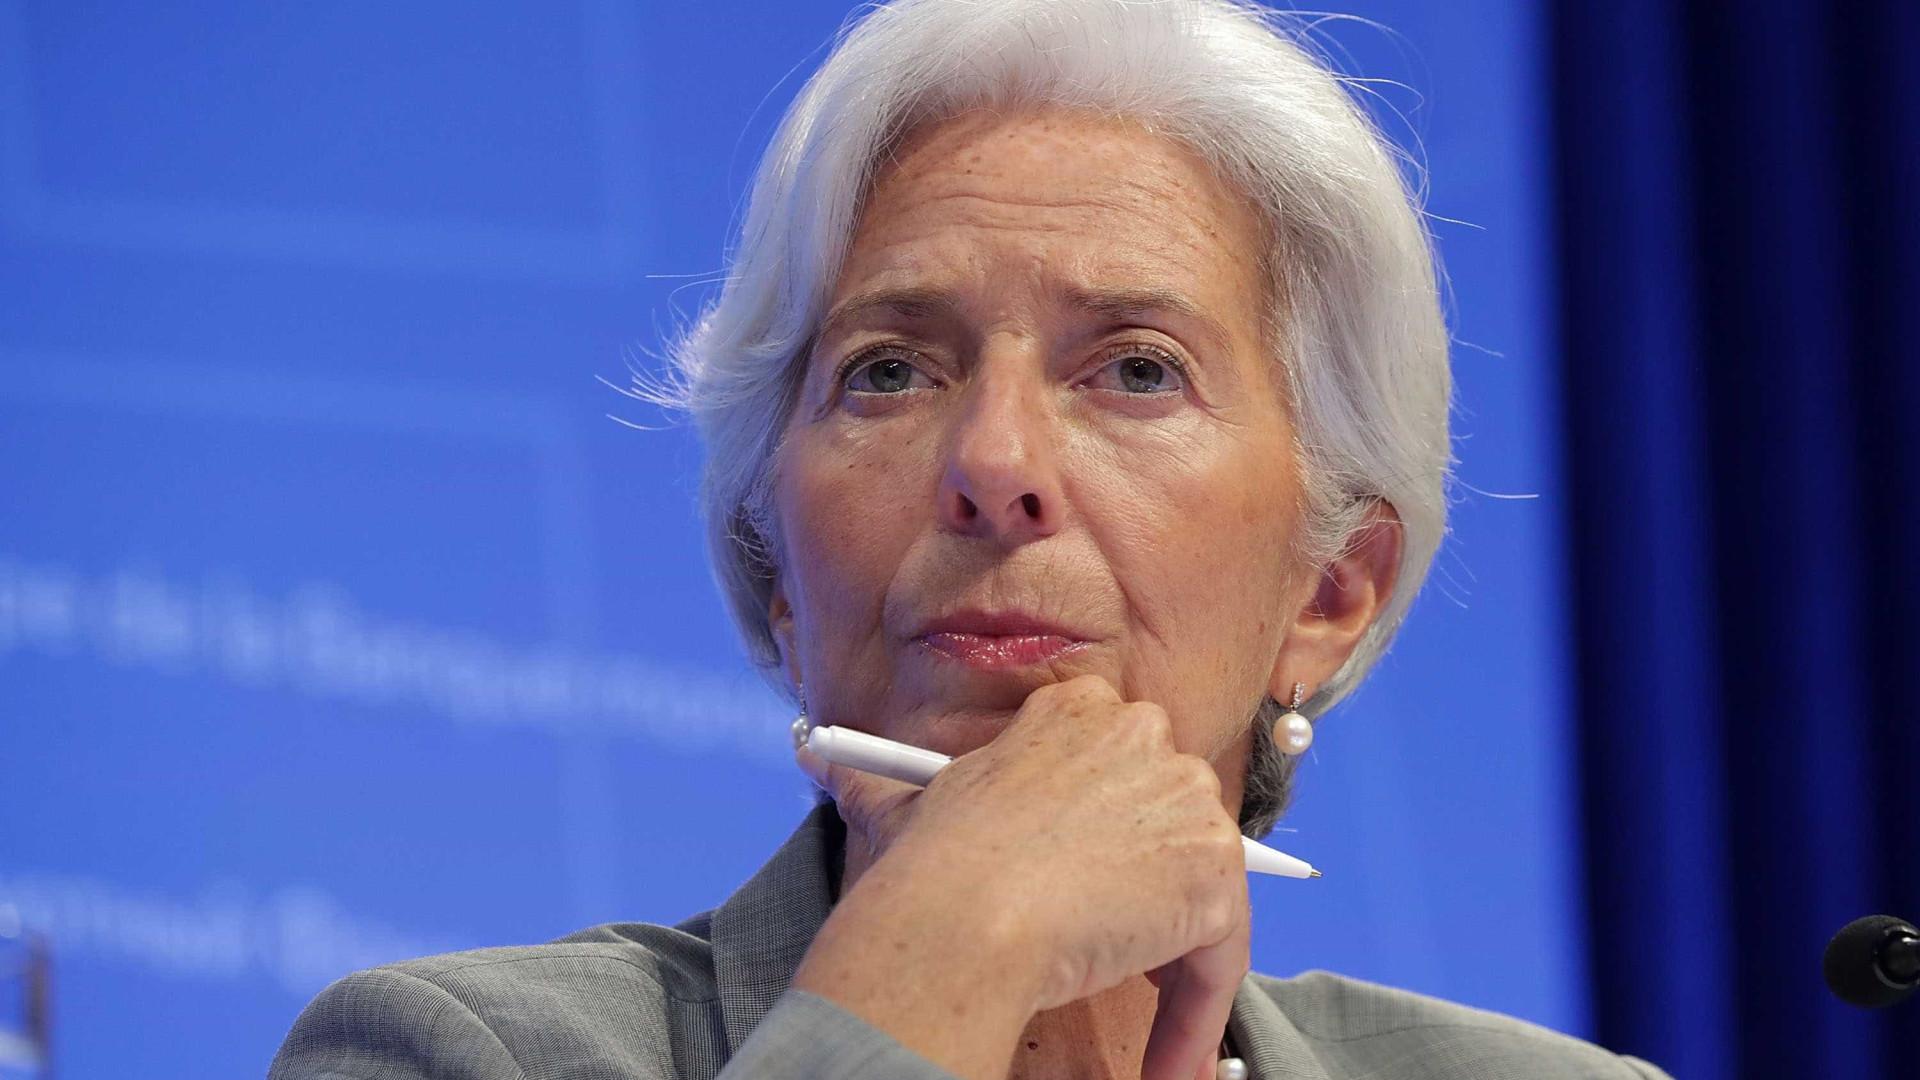 BCE: há risco de nova onda da covid na Europa, mas manteremos apoio, diz Lagarde